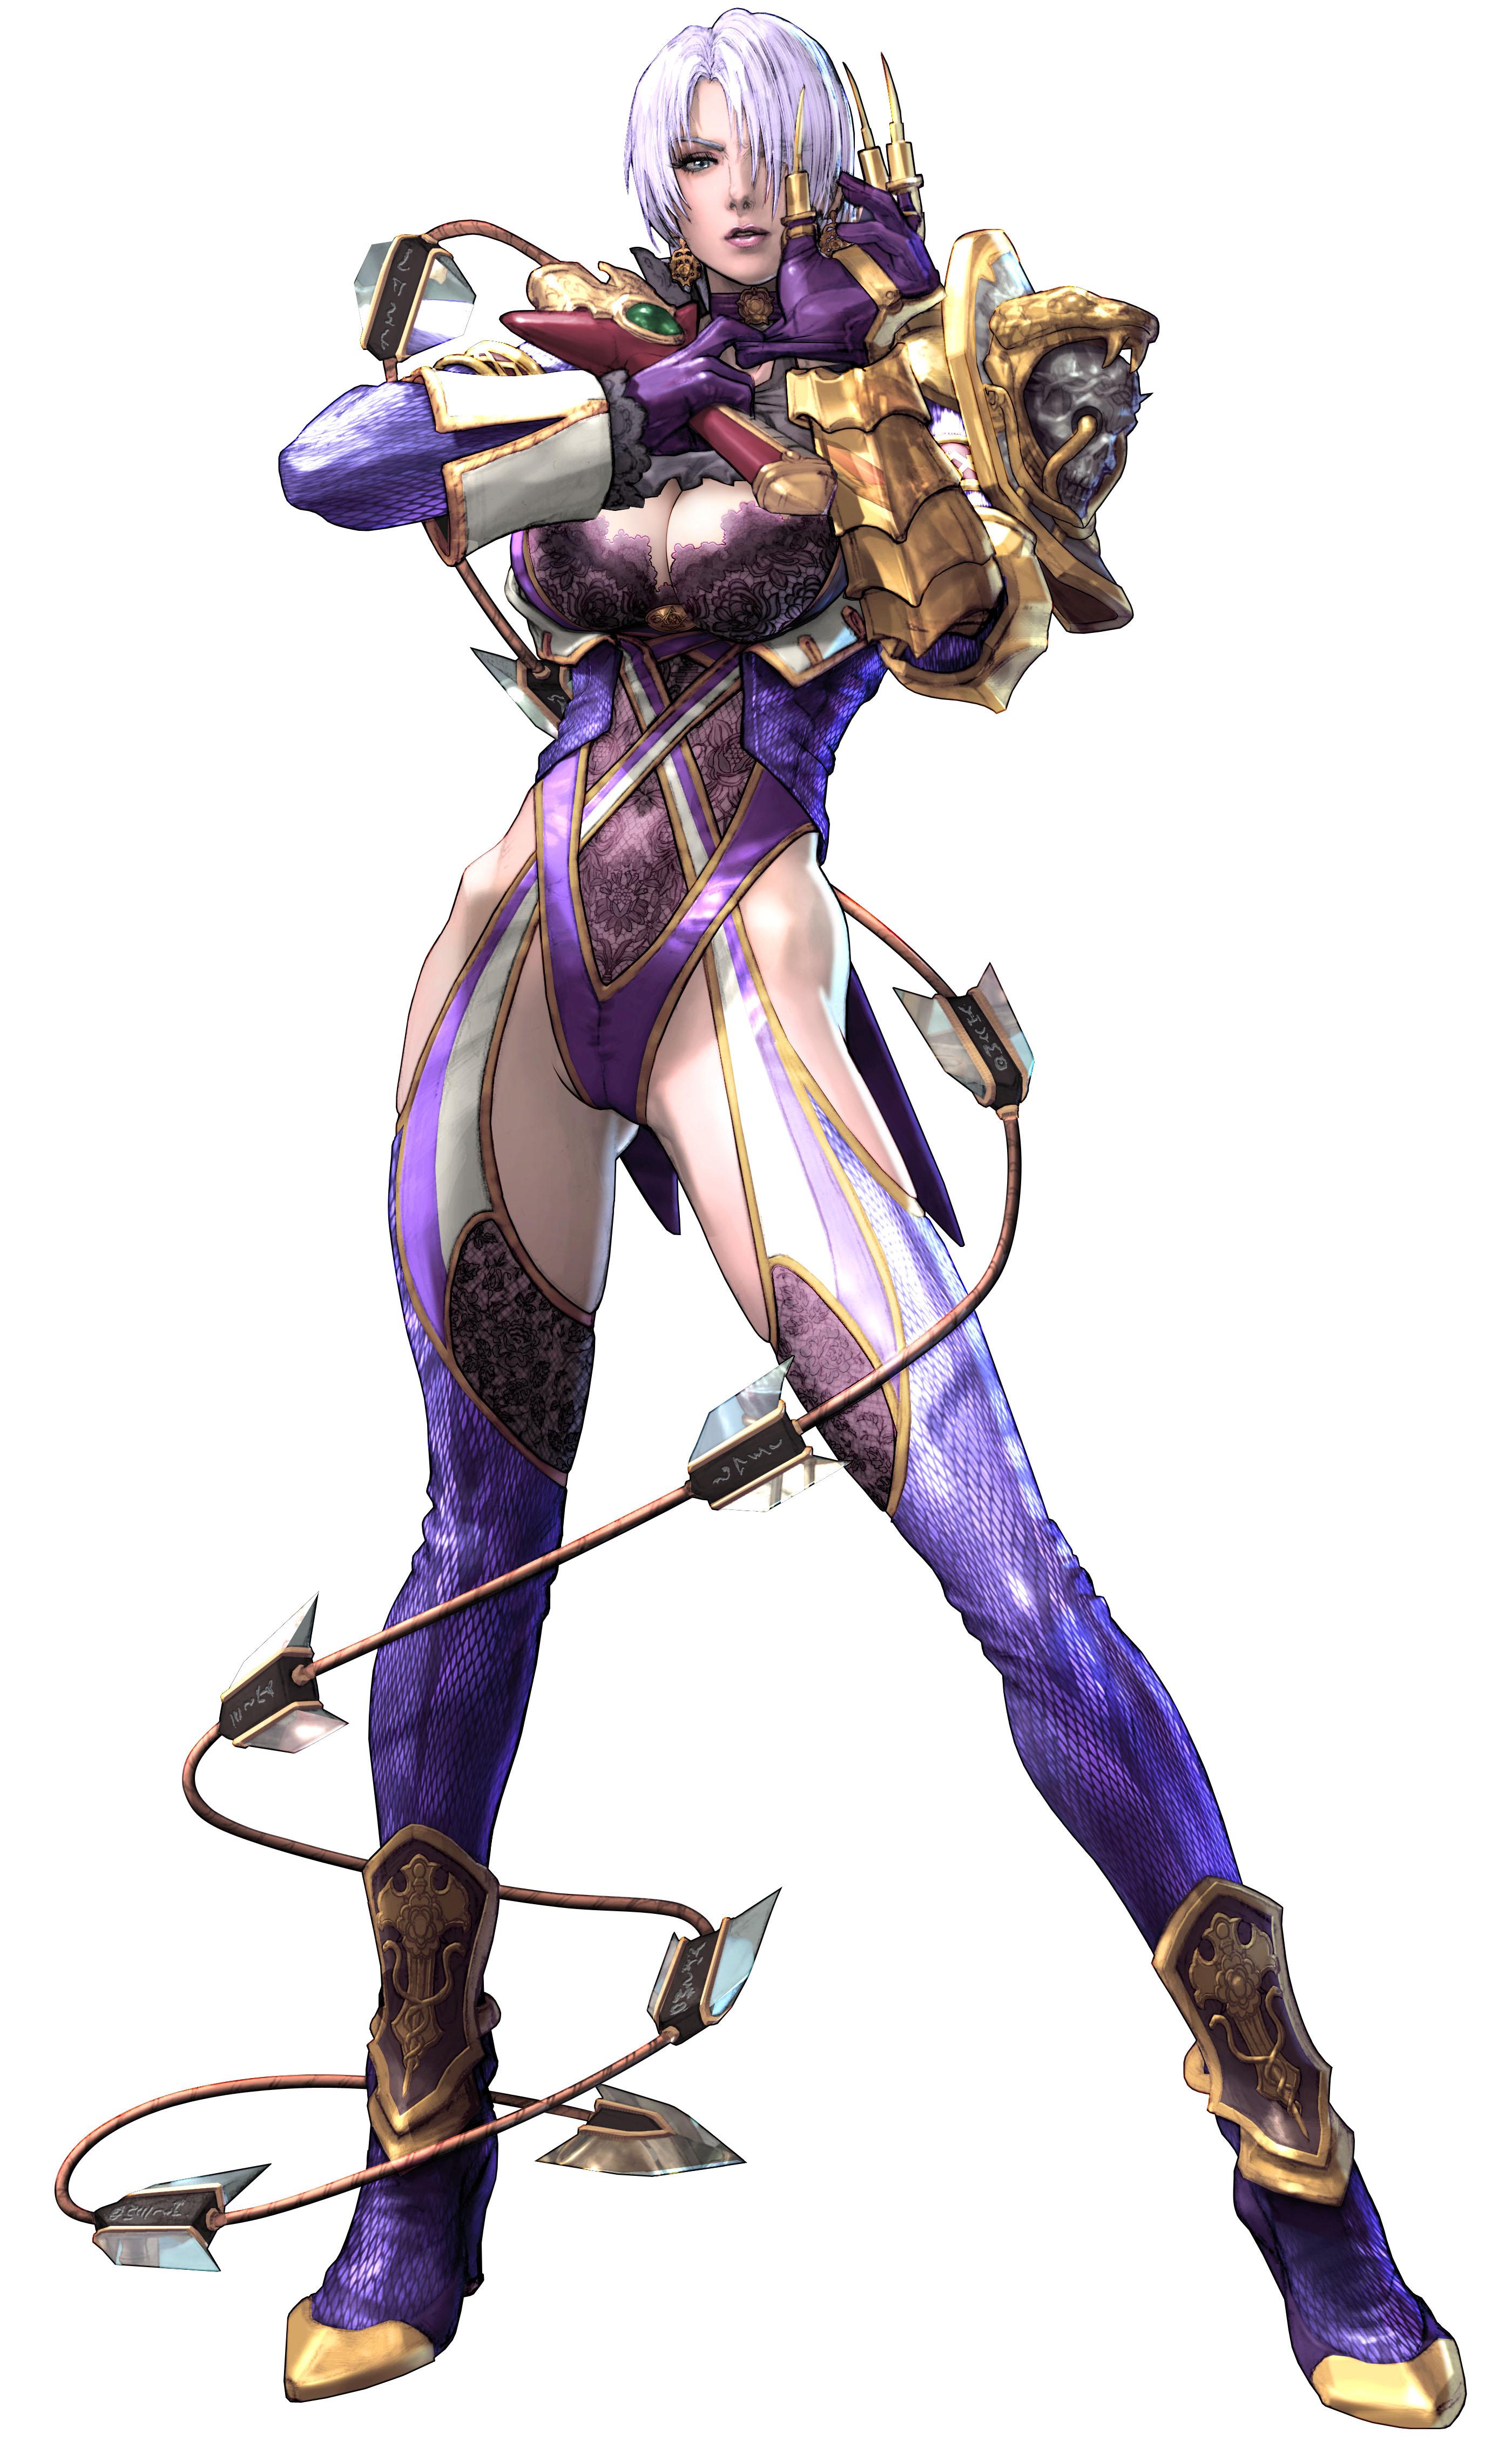 Anime Characters Soul Calibur 5 : Soul calibur official concept art showcase wayrun